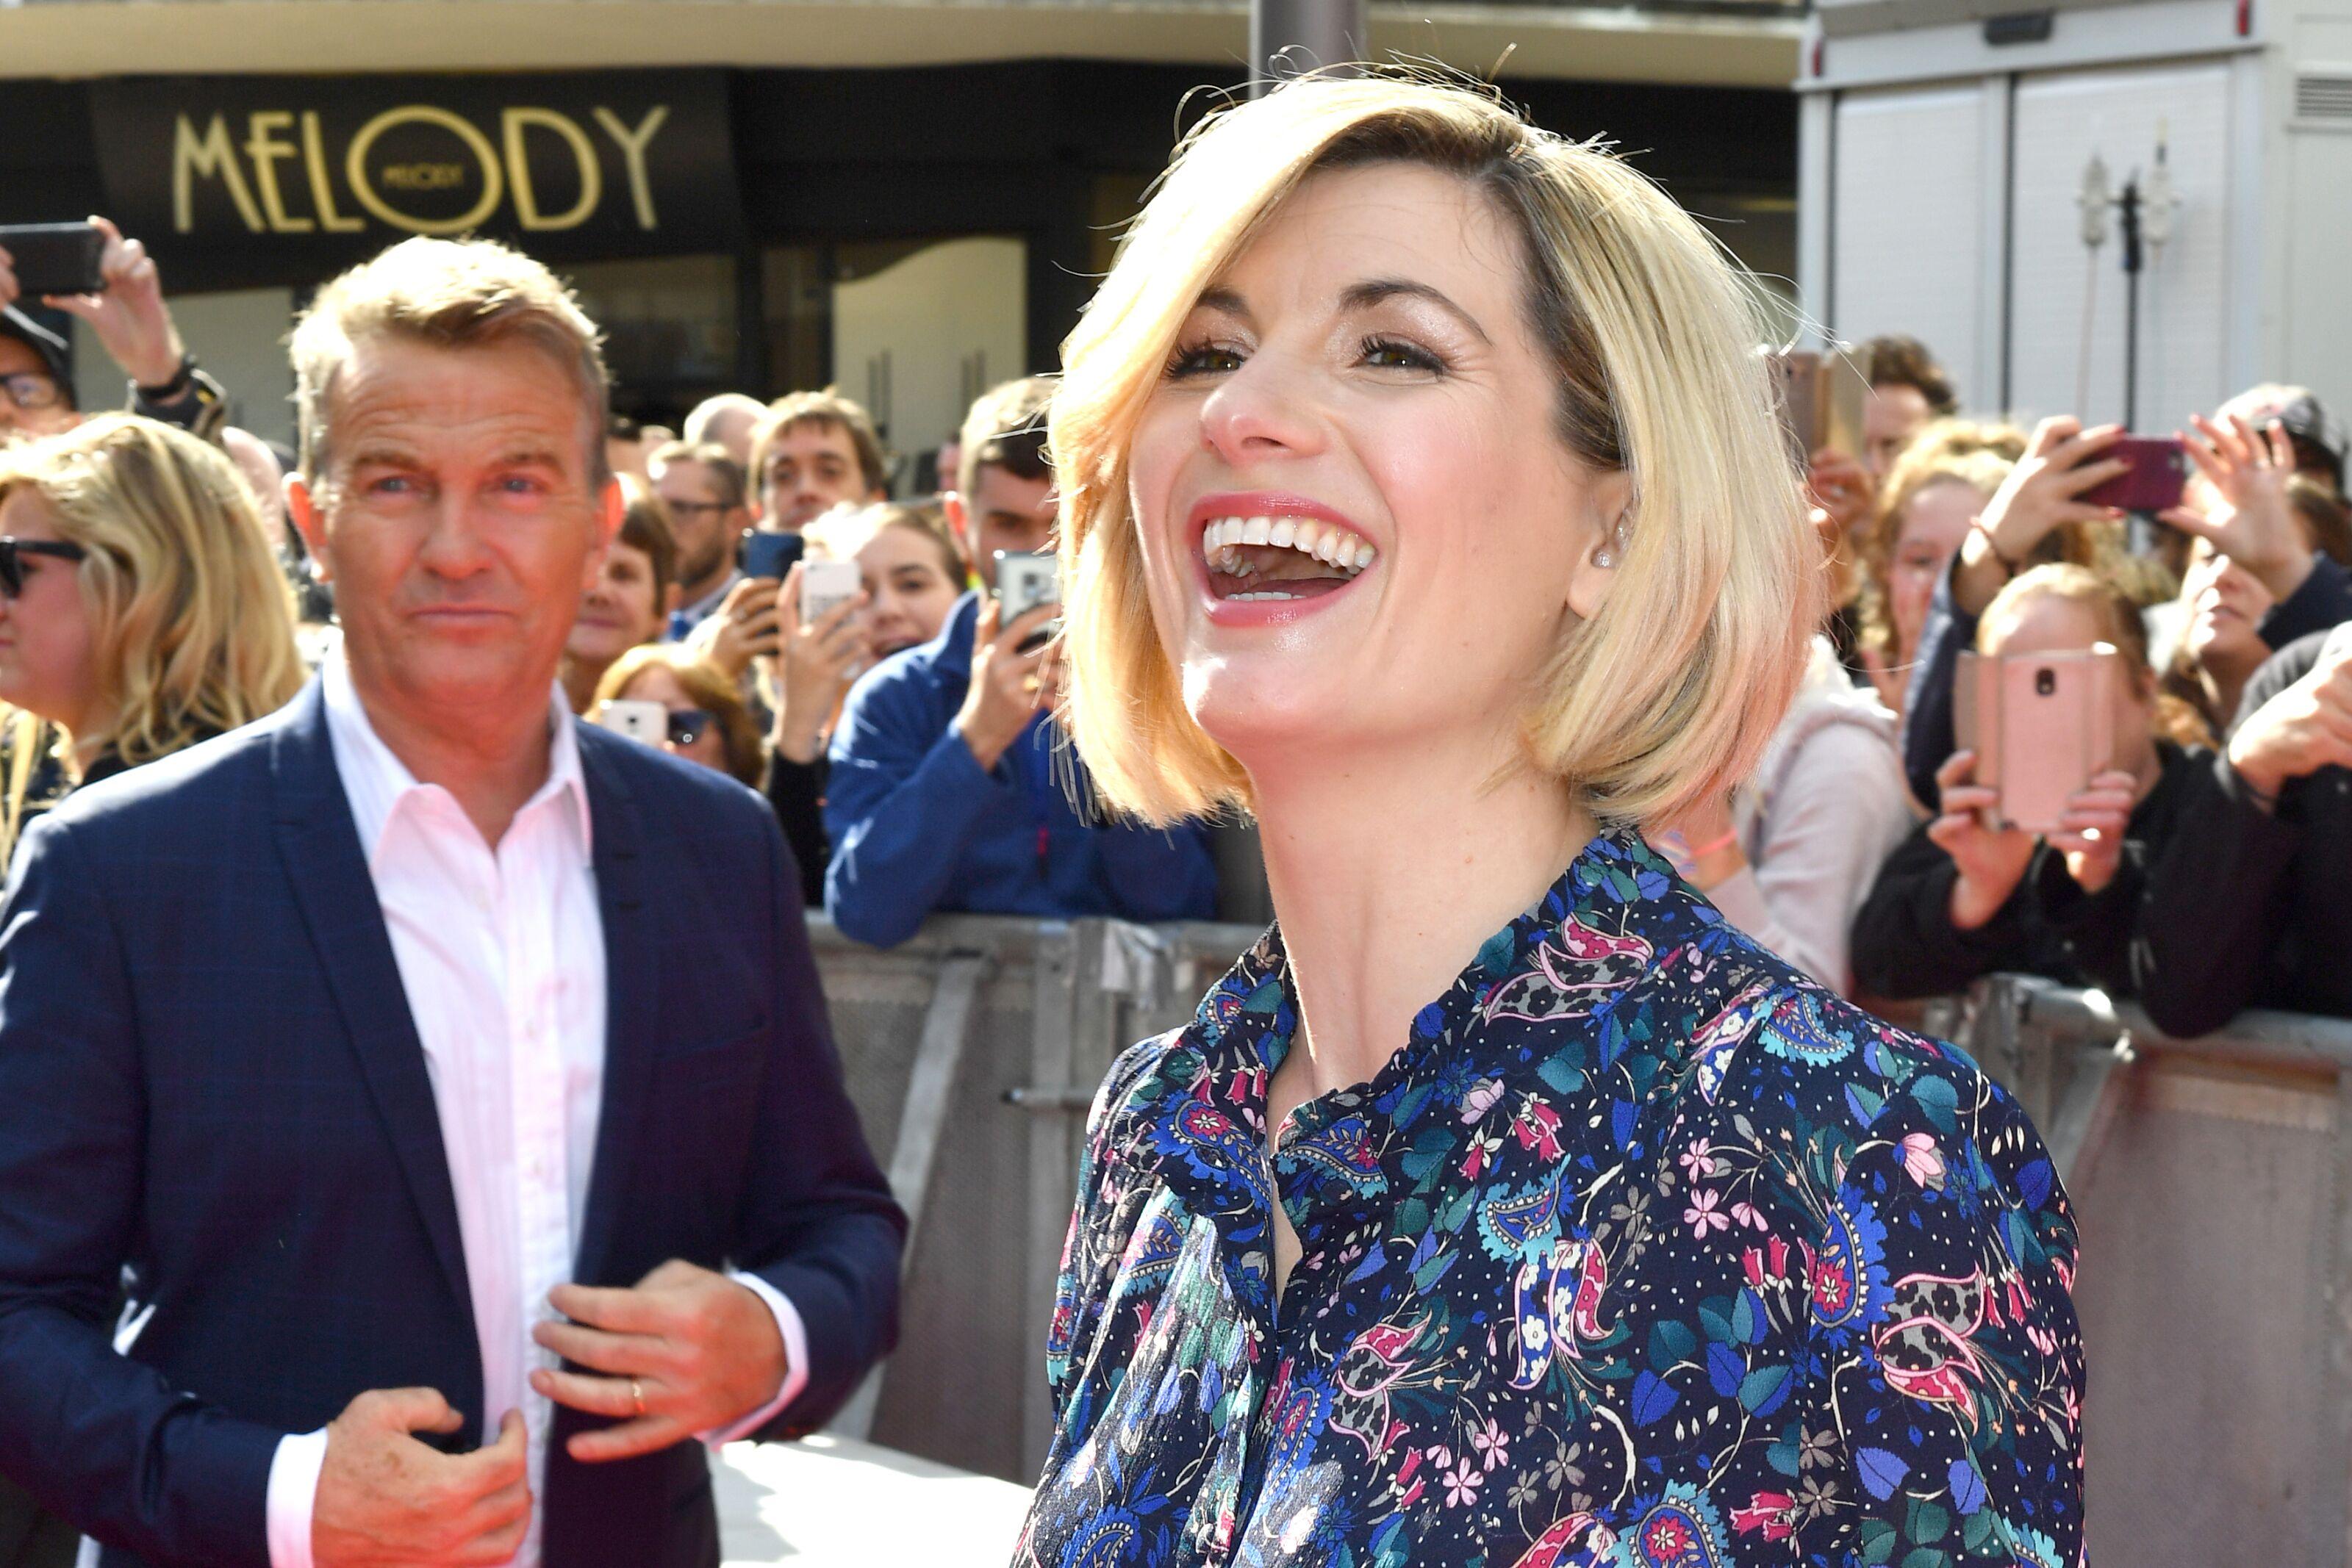 Is Doctor Who season 11 coming to Netflix?